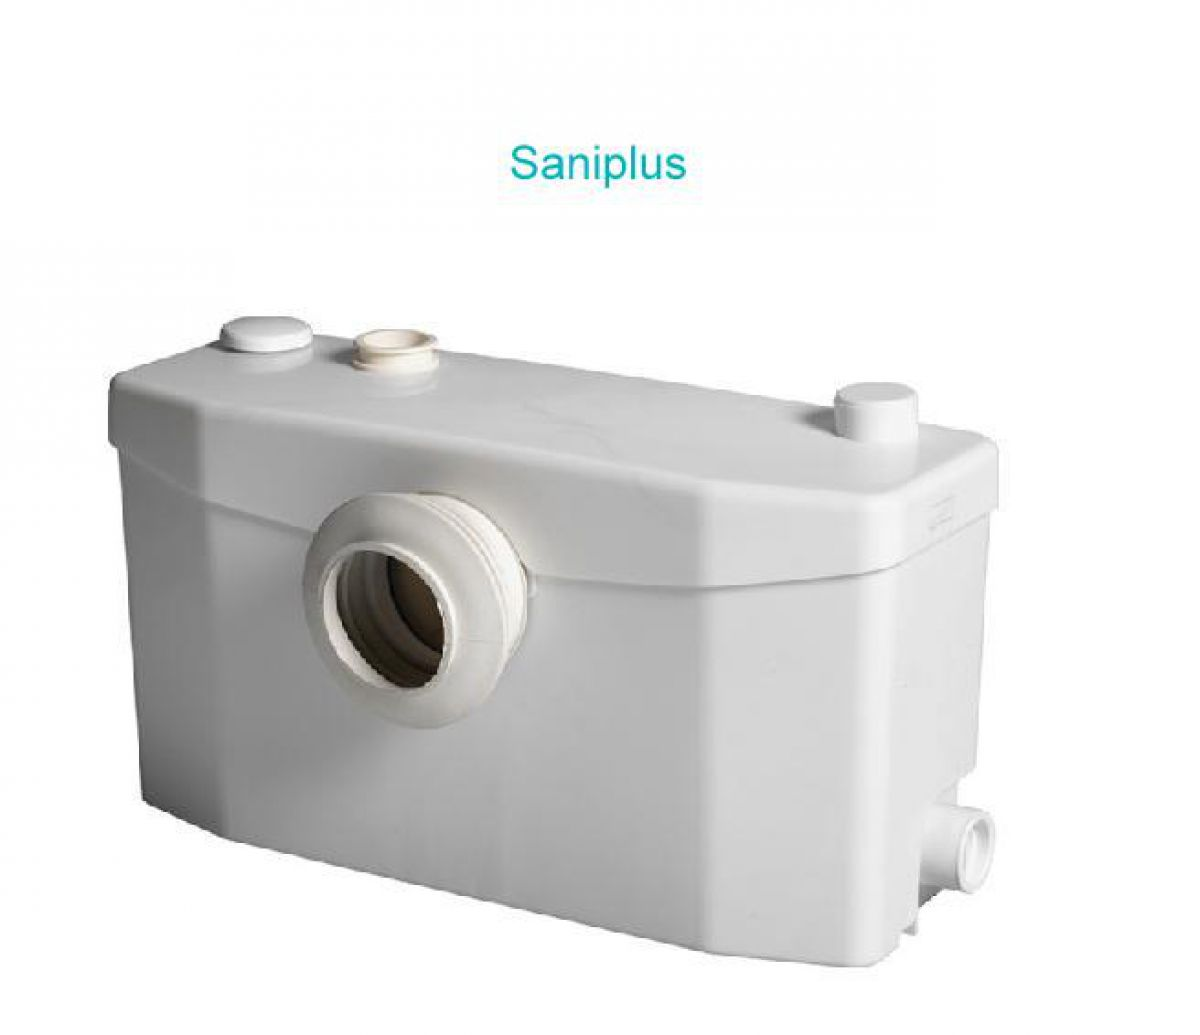 Saniflo Saniplus Up Macerator - 6003